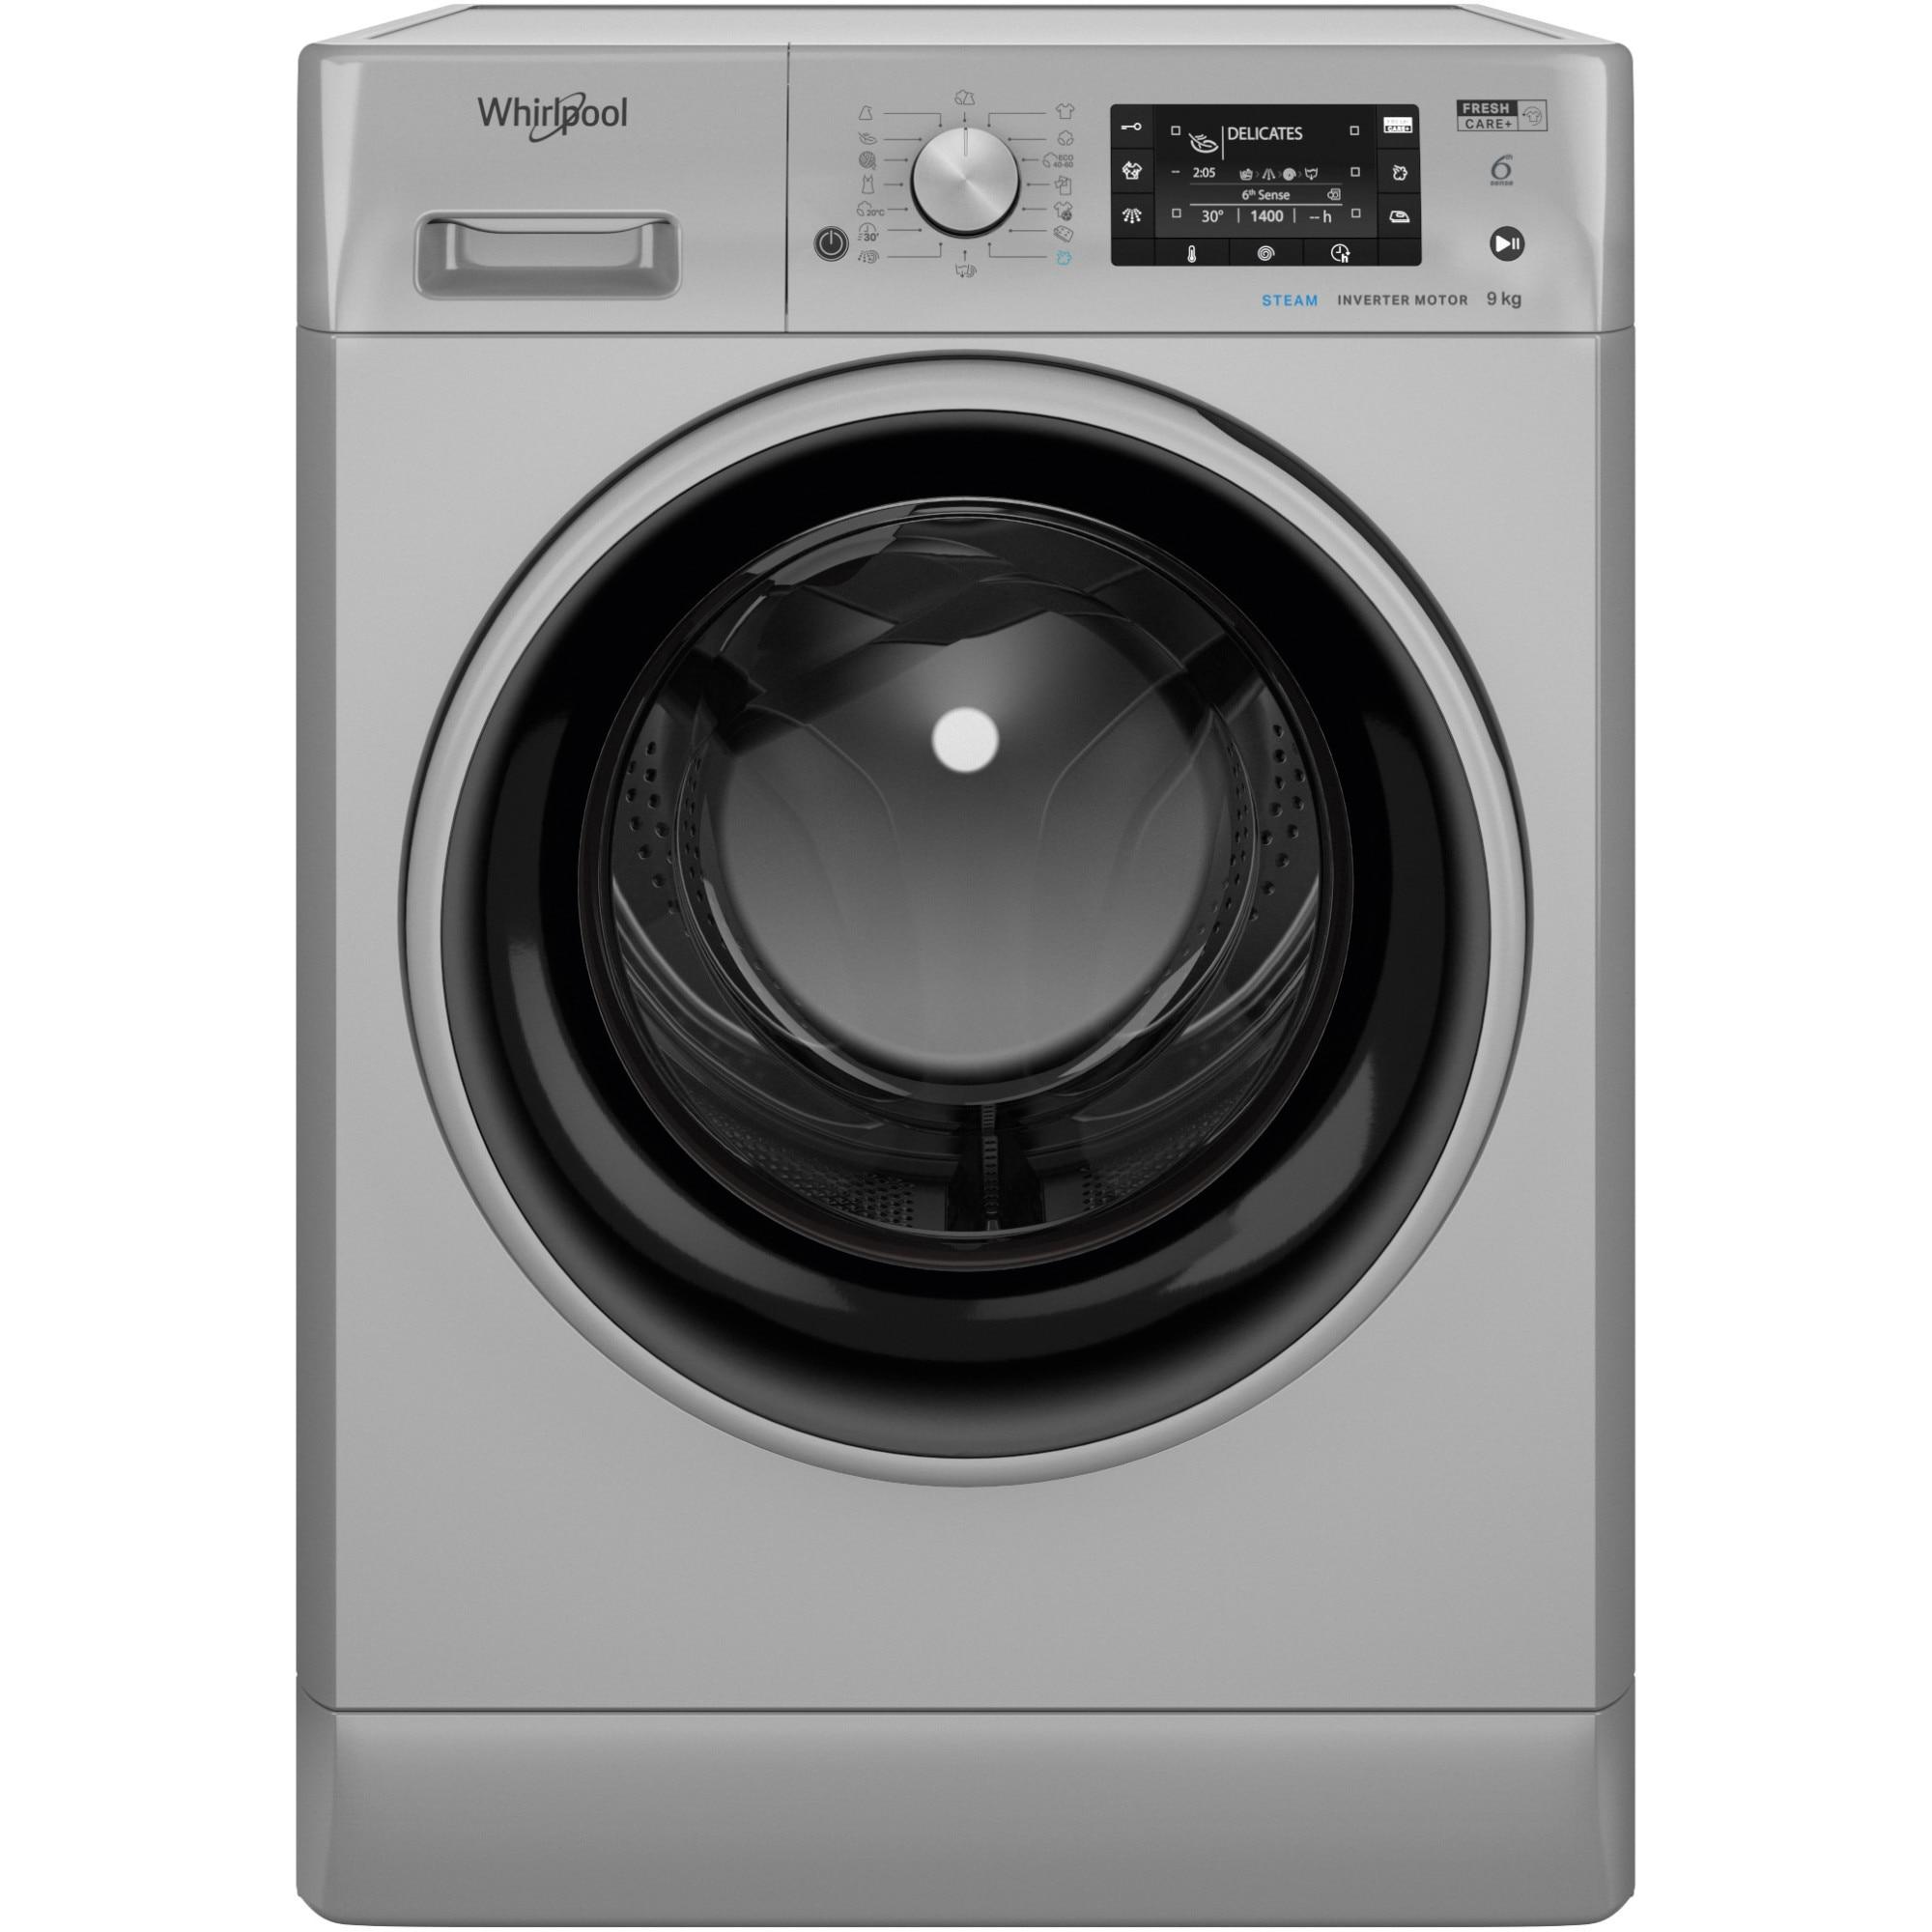 Fotografie Masina de spalat rufe Whirlpool FFD9448SBSVEU, 9kg, 1400 rpm, Clasa C, Tehnologia al-6lea Simt, Motor Inverter, FreshCare+, Steam Refresh, Steam Hygiene, Display LCD, Argintiu